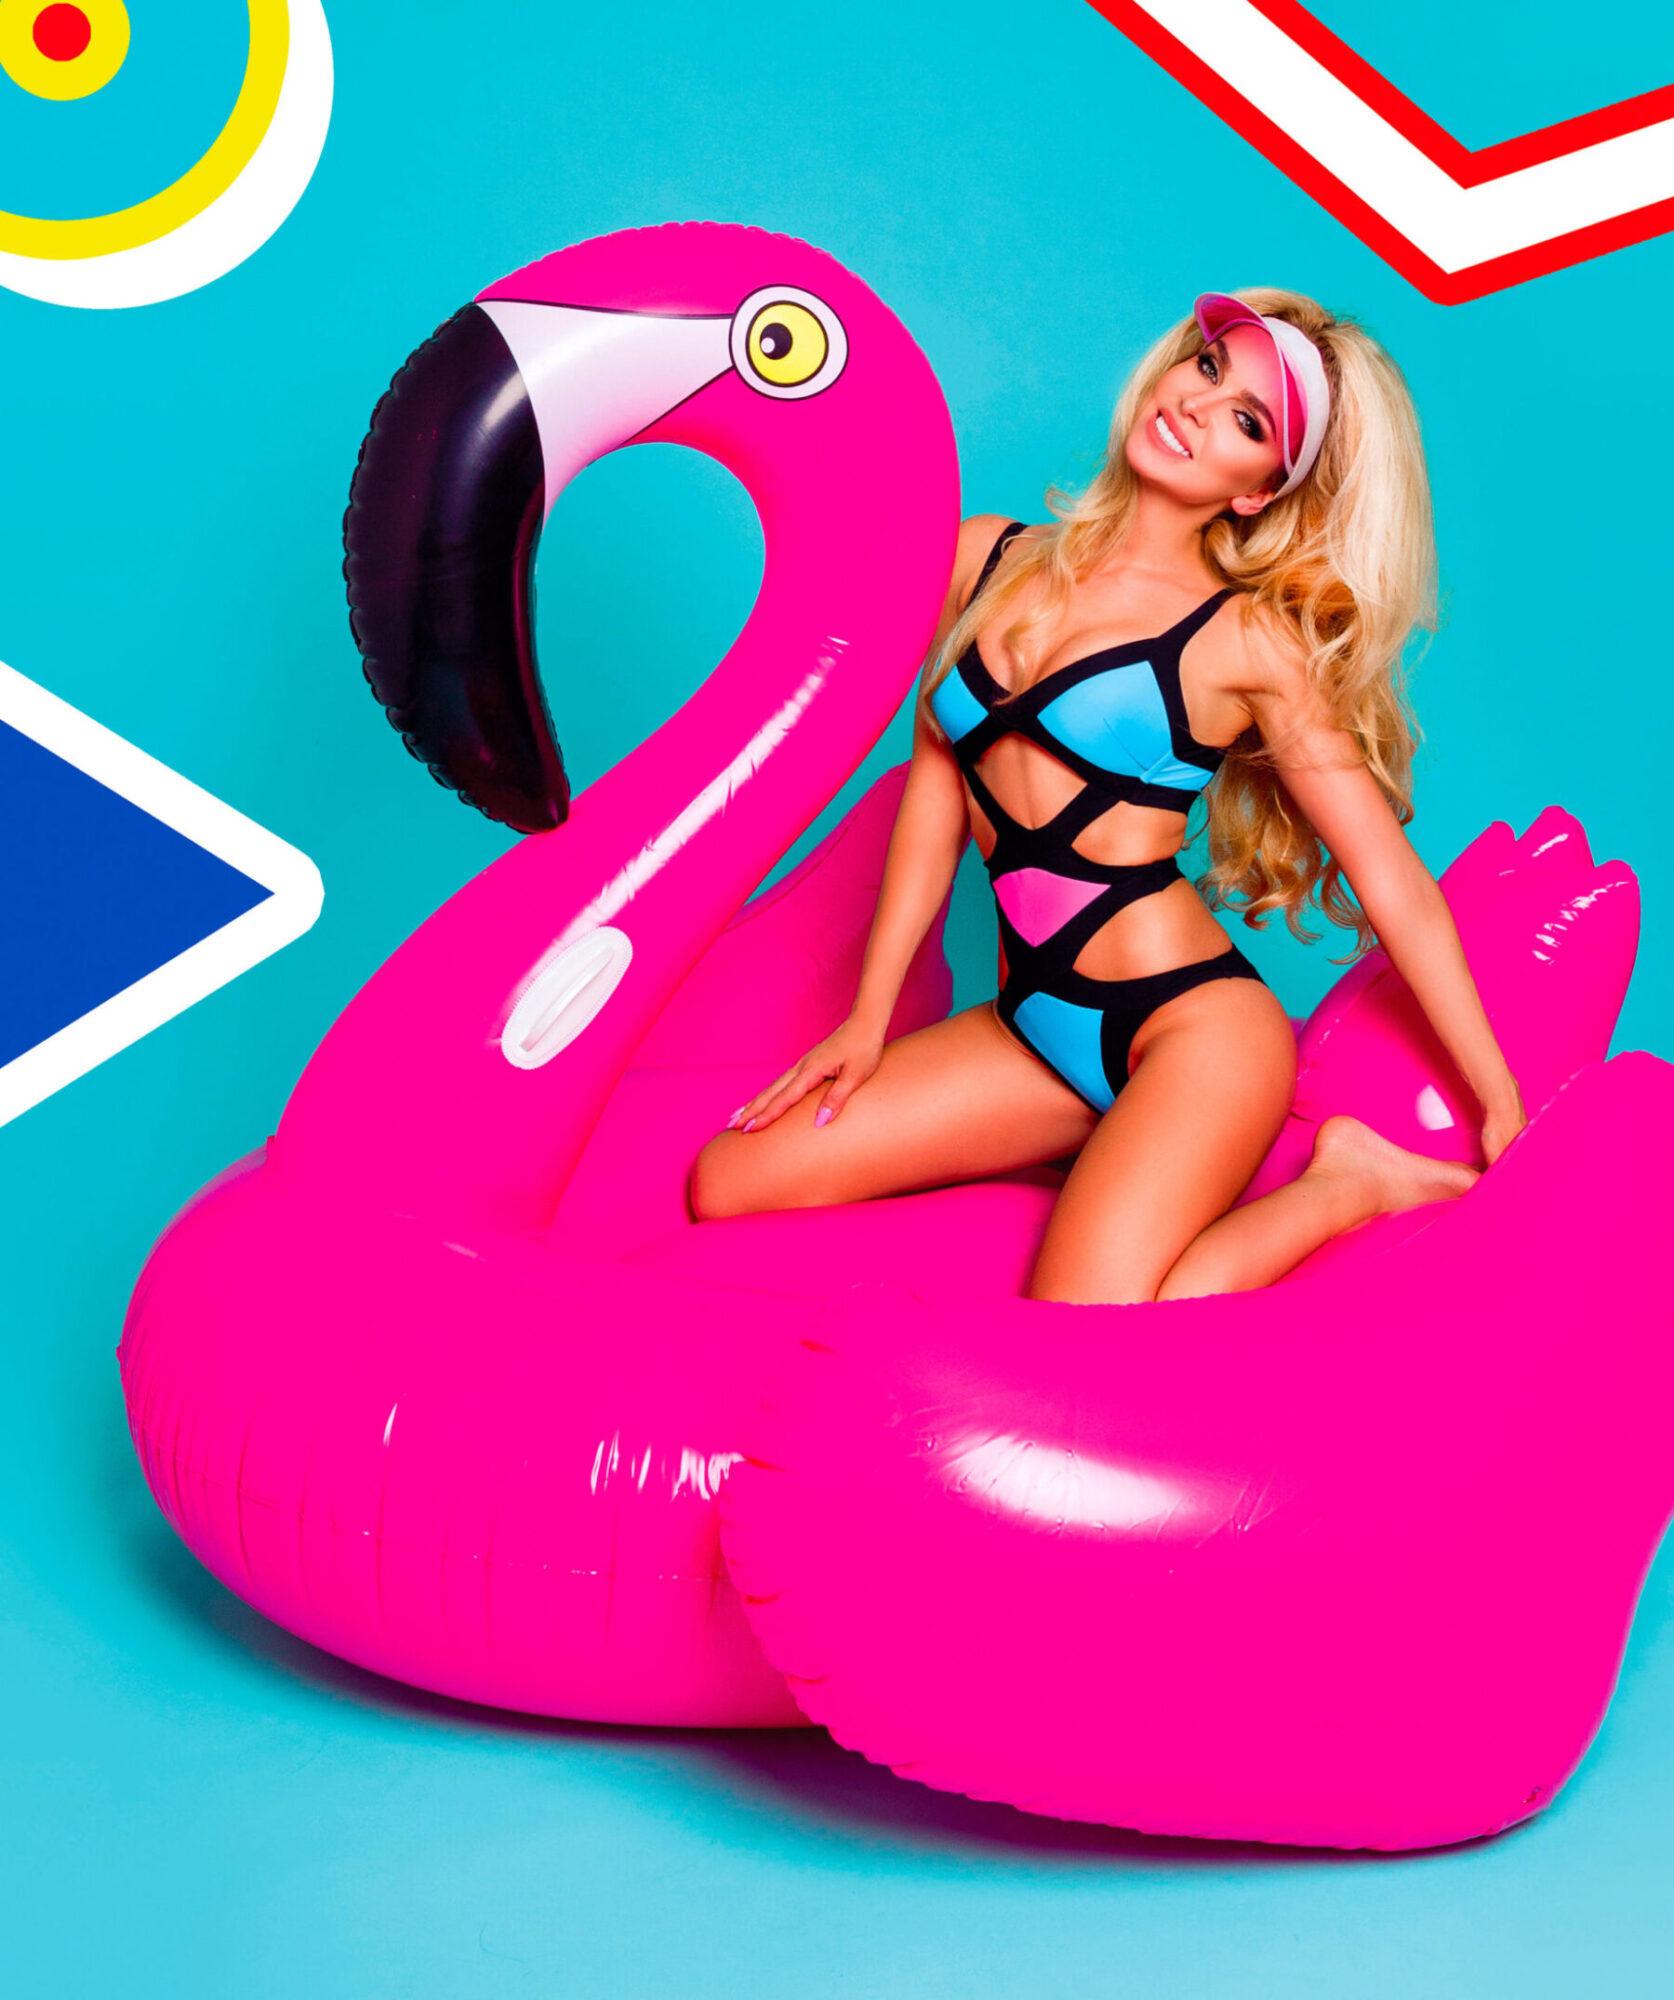 Nikols_russian roulette magazine